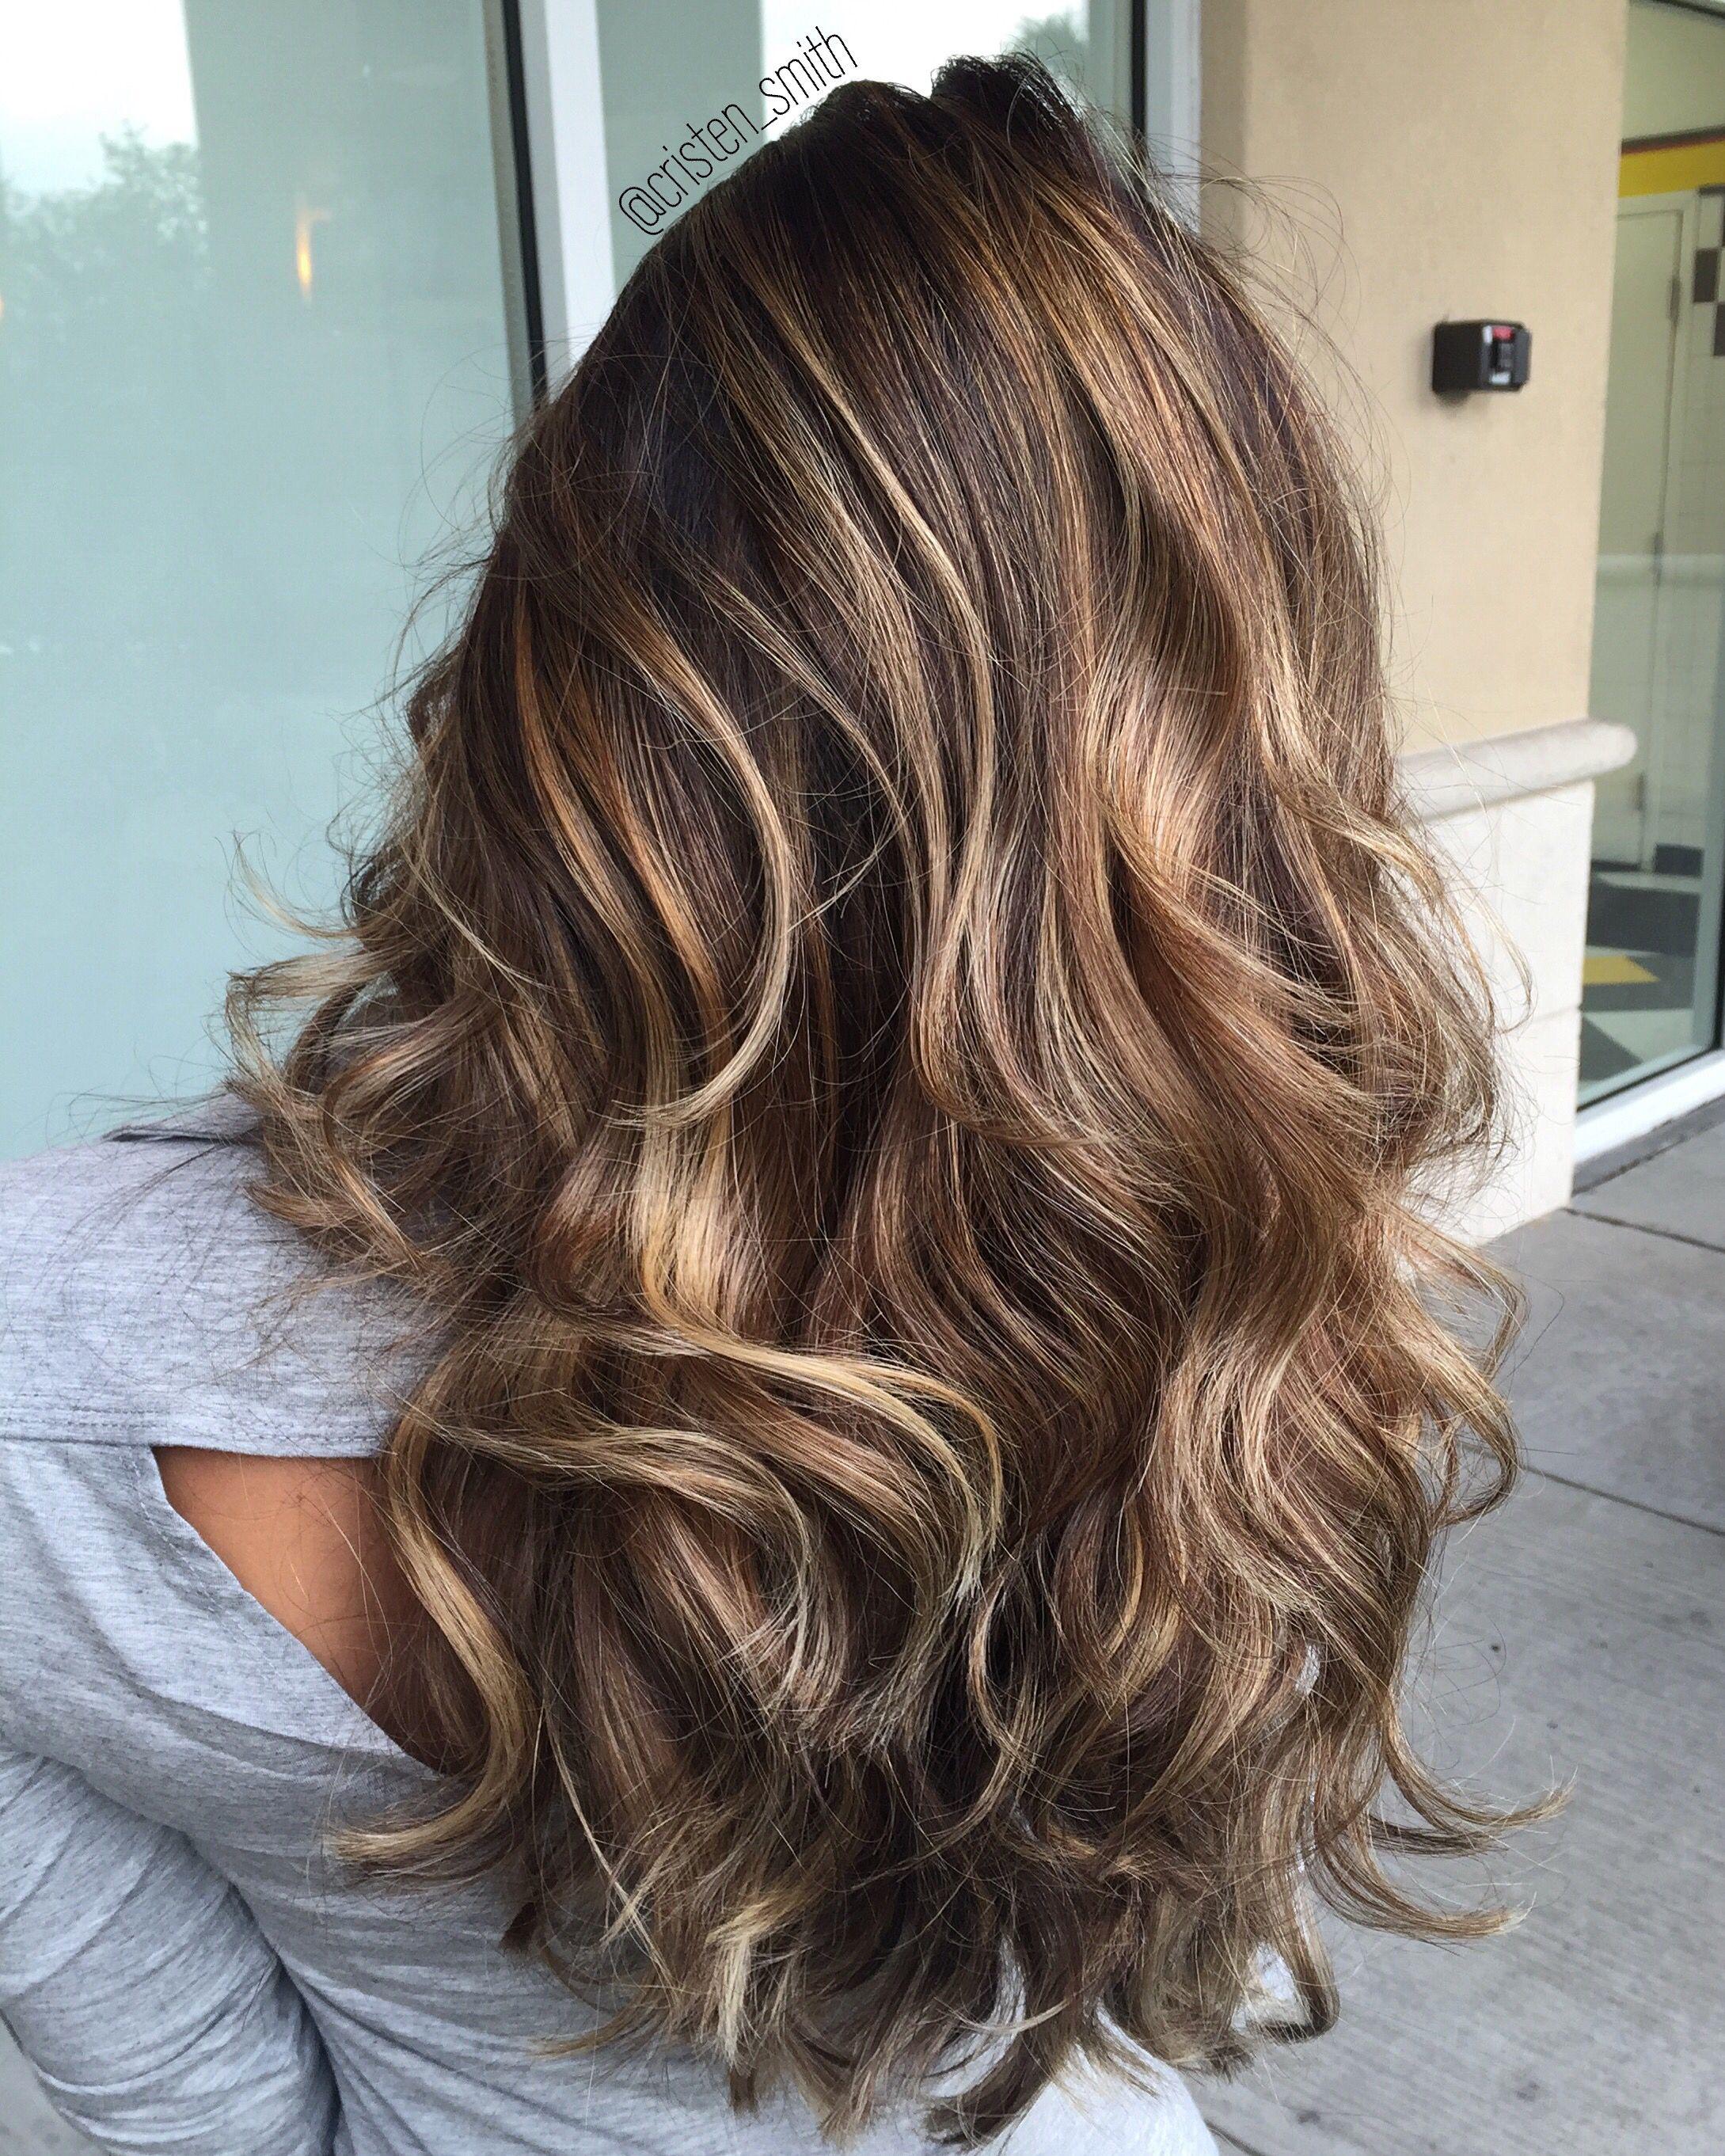 Ashy blonde balayage beauty hair i need a haircut pinterest